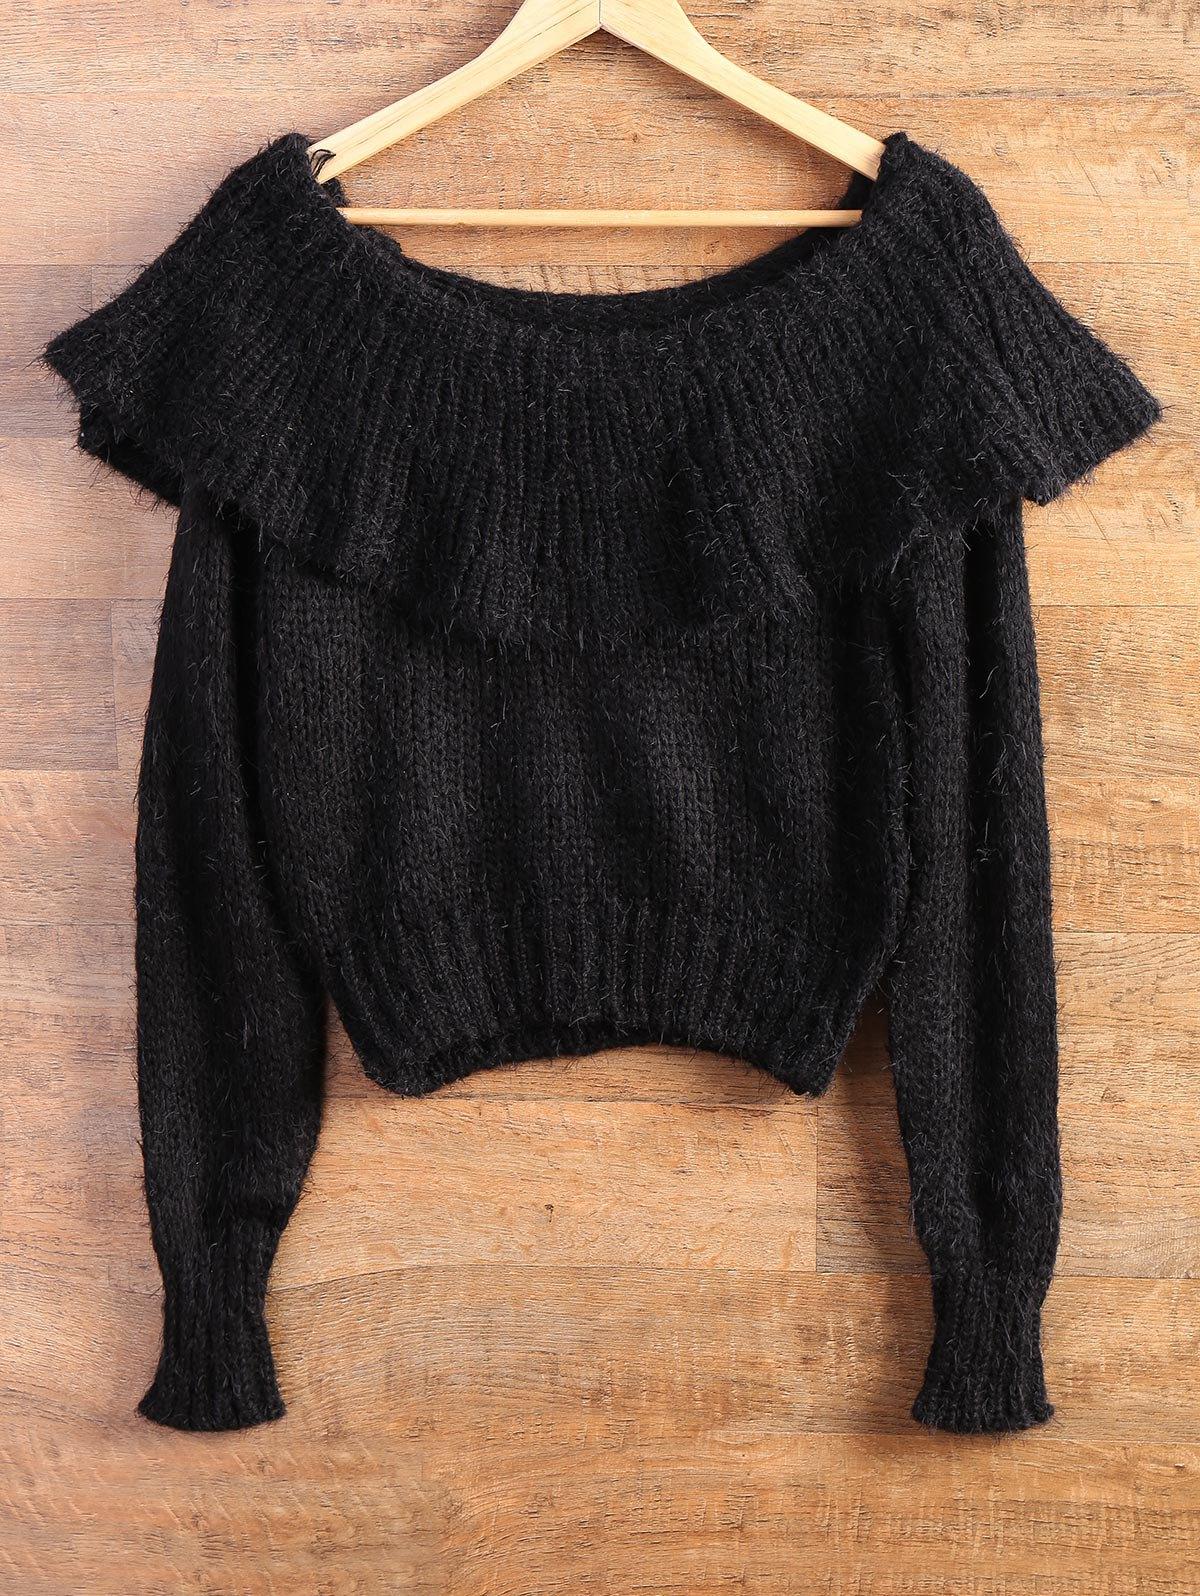 Flounce Ruffles High-Low Fuzzy Sweater